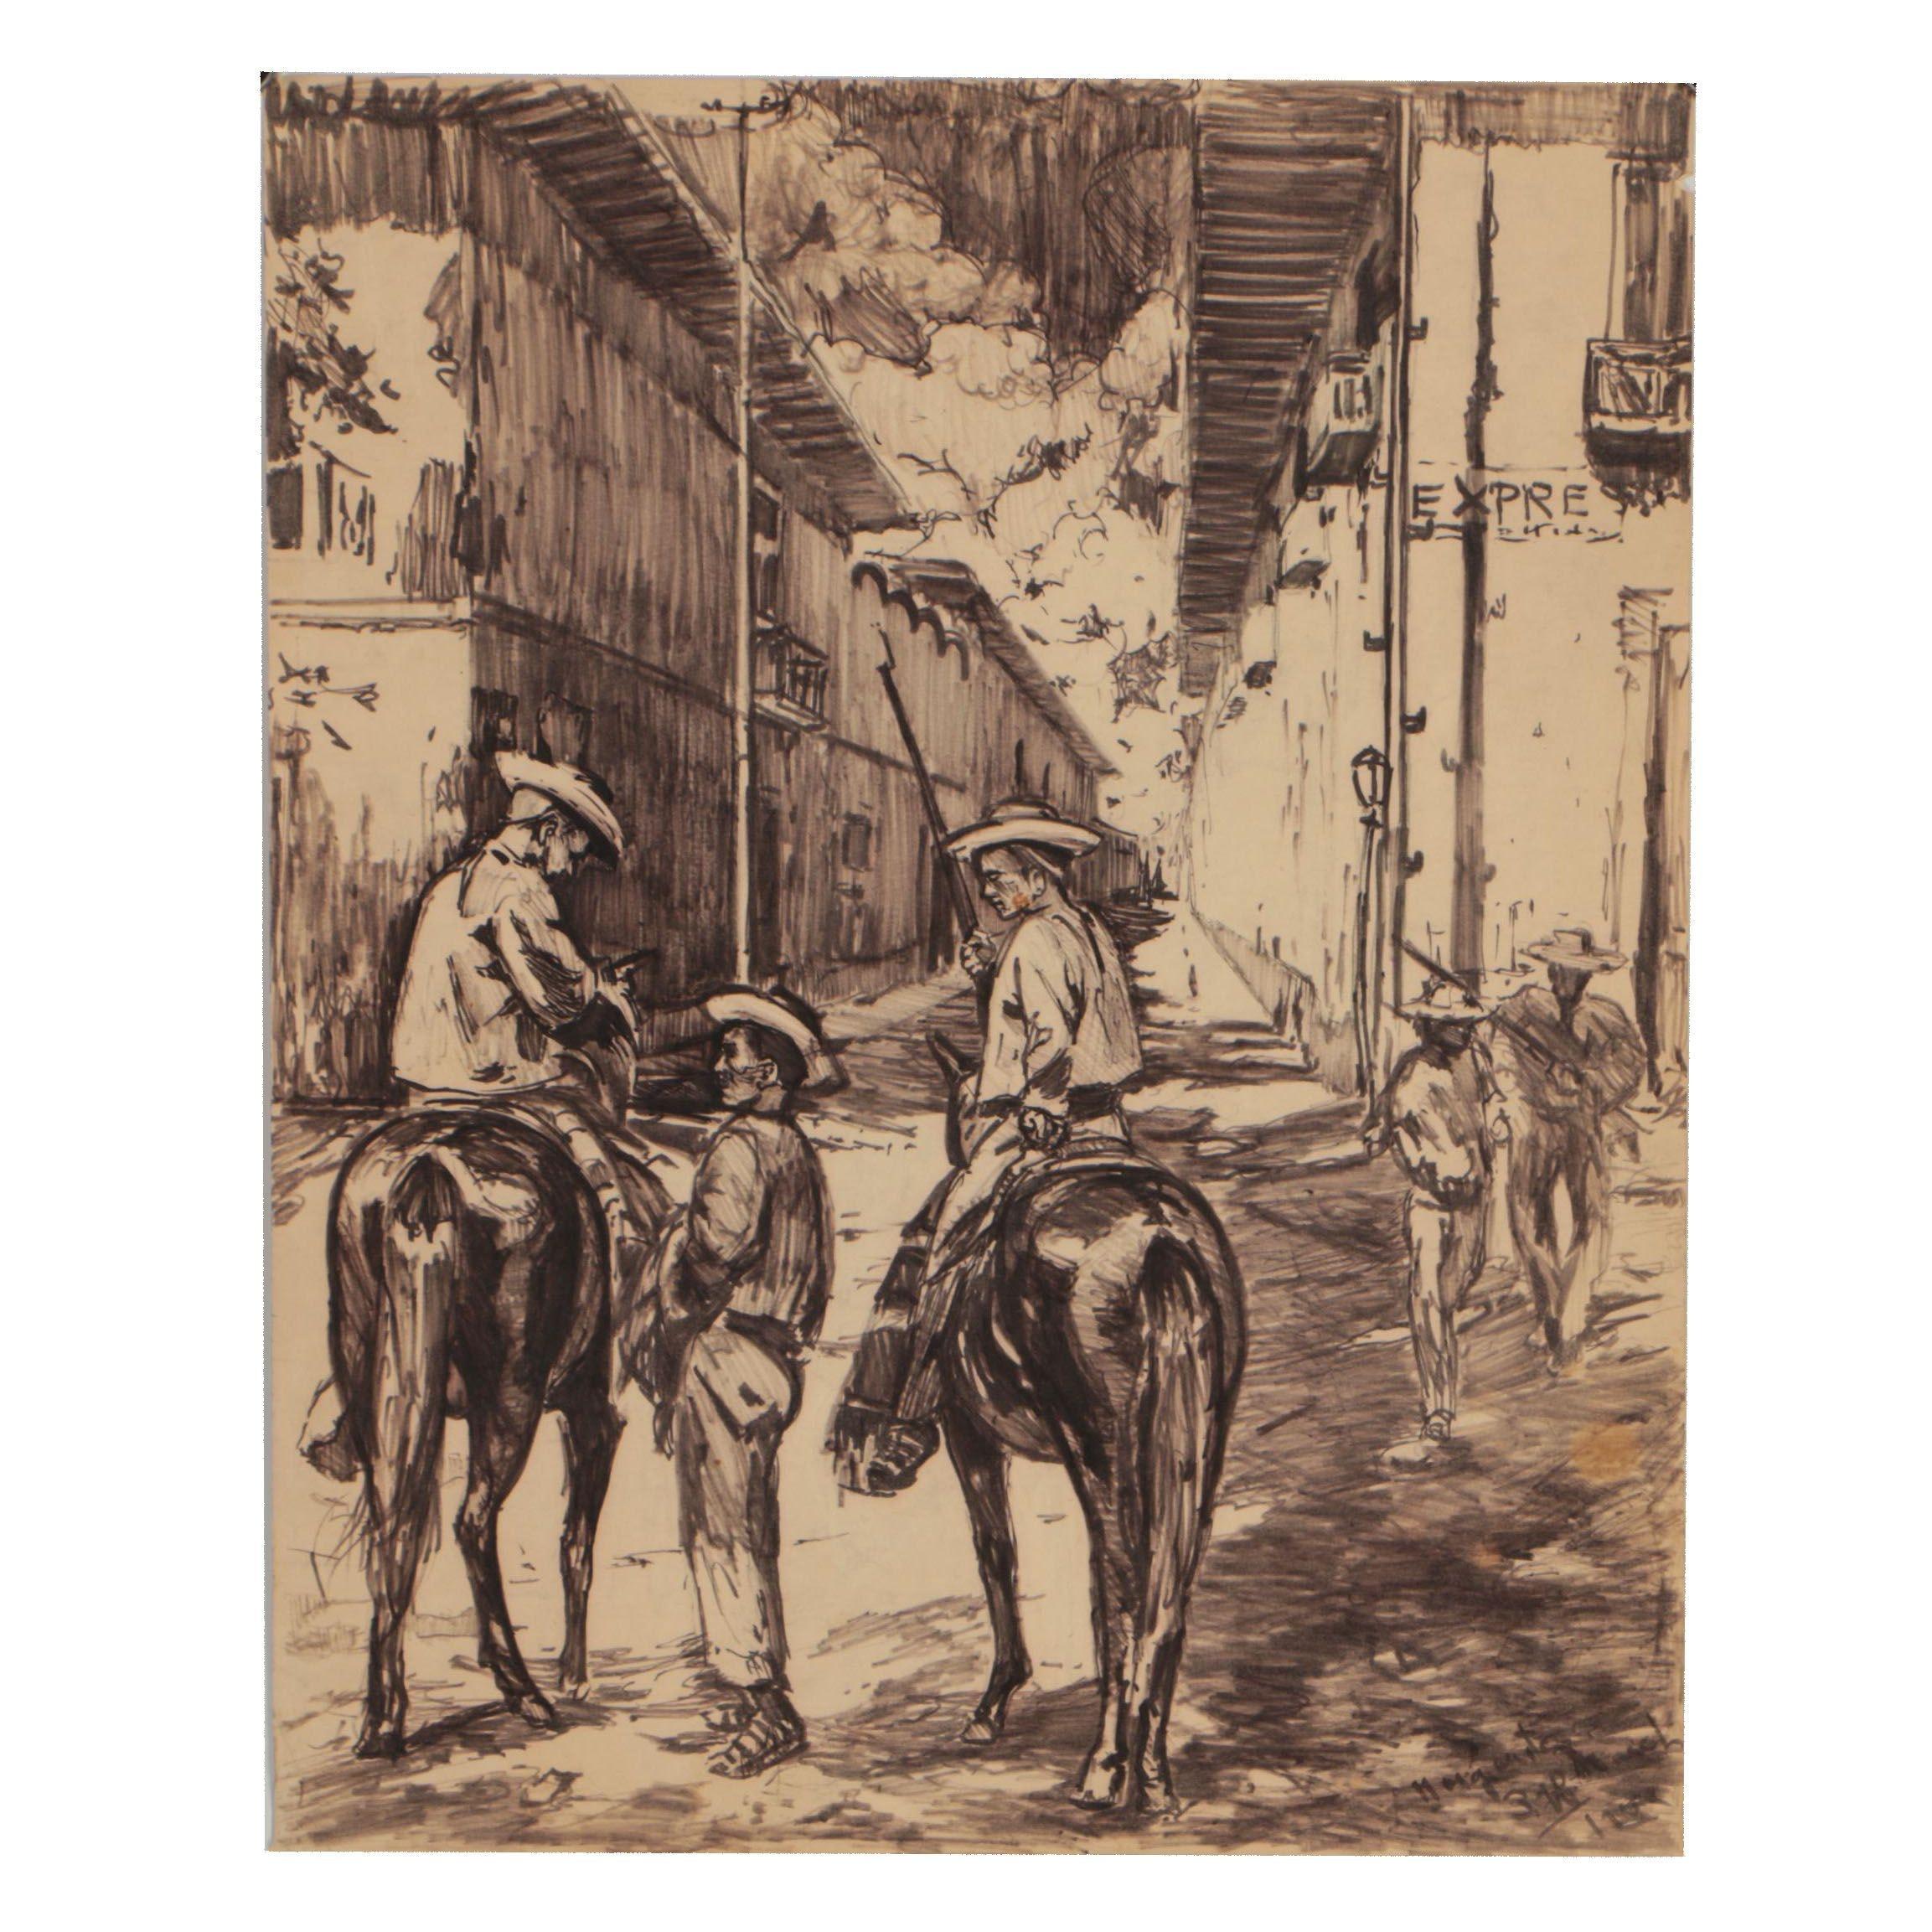 Margarita Ziff March Ink Drawing of Western Street Scene